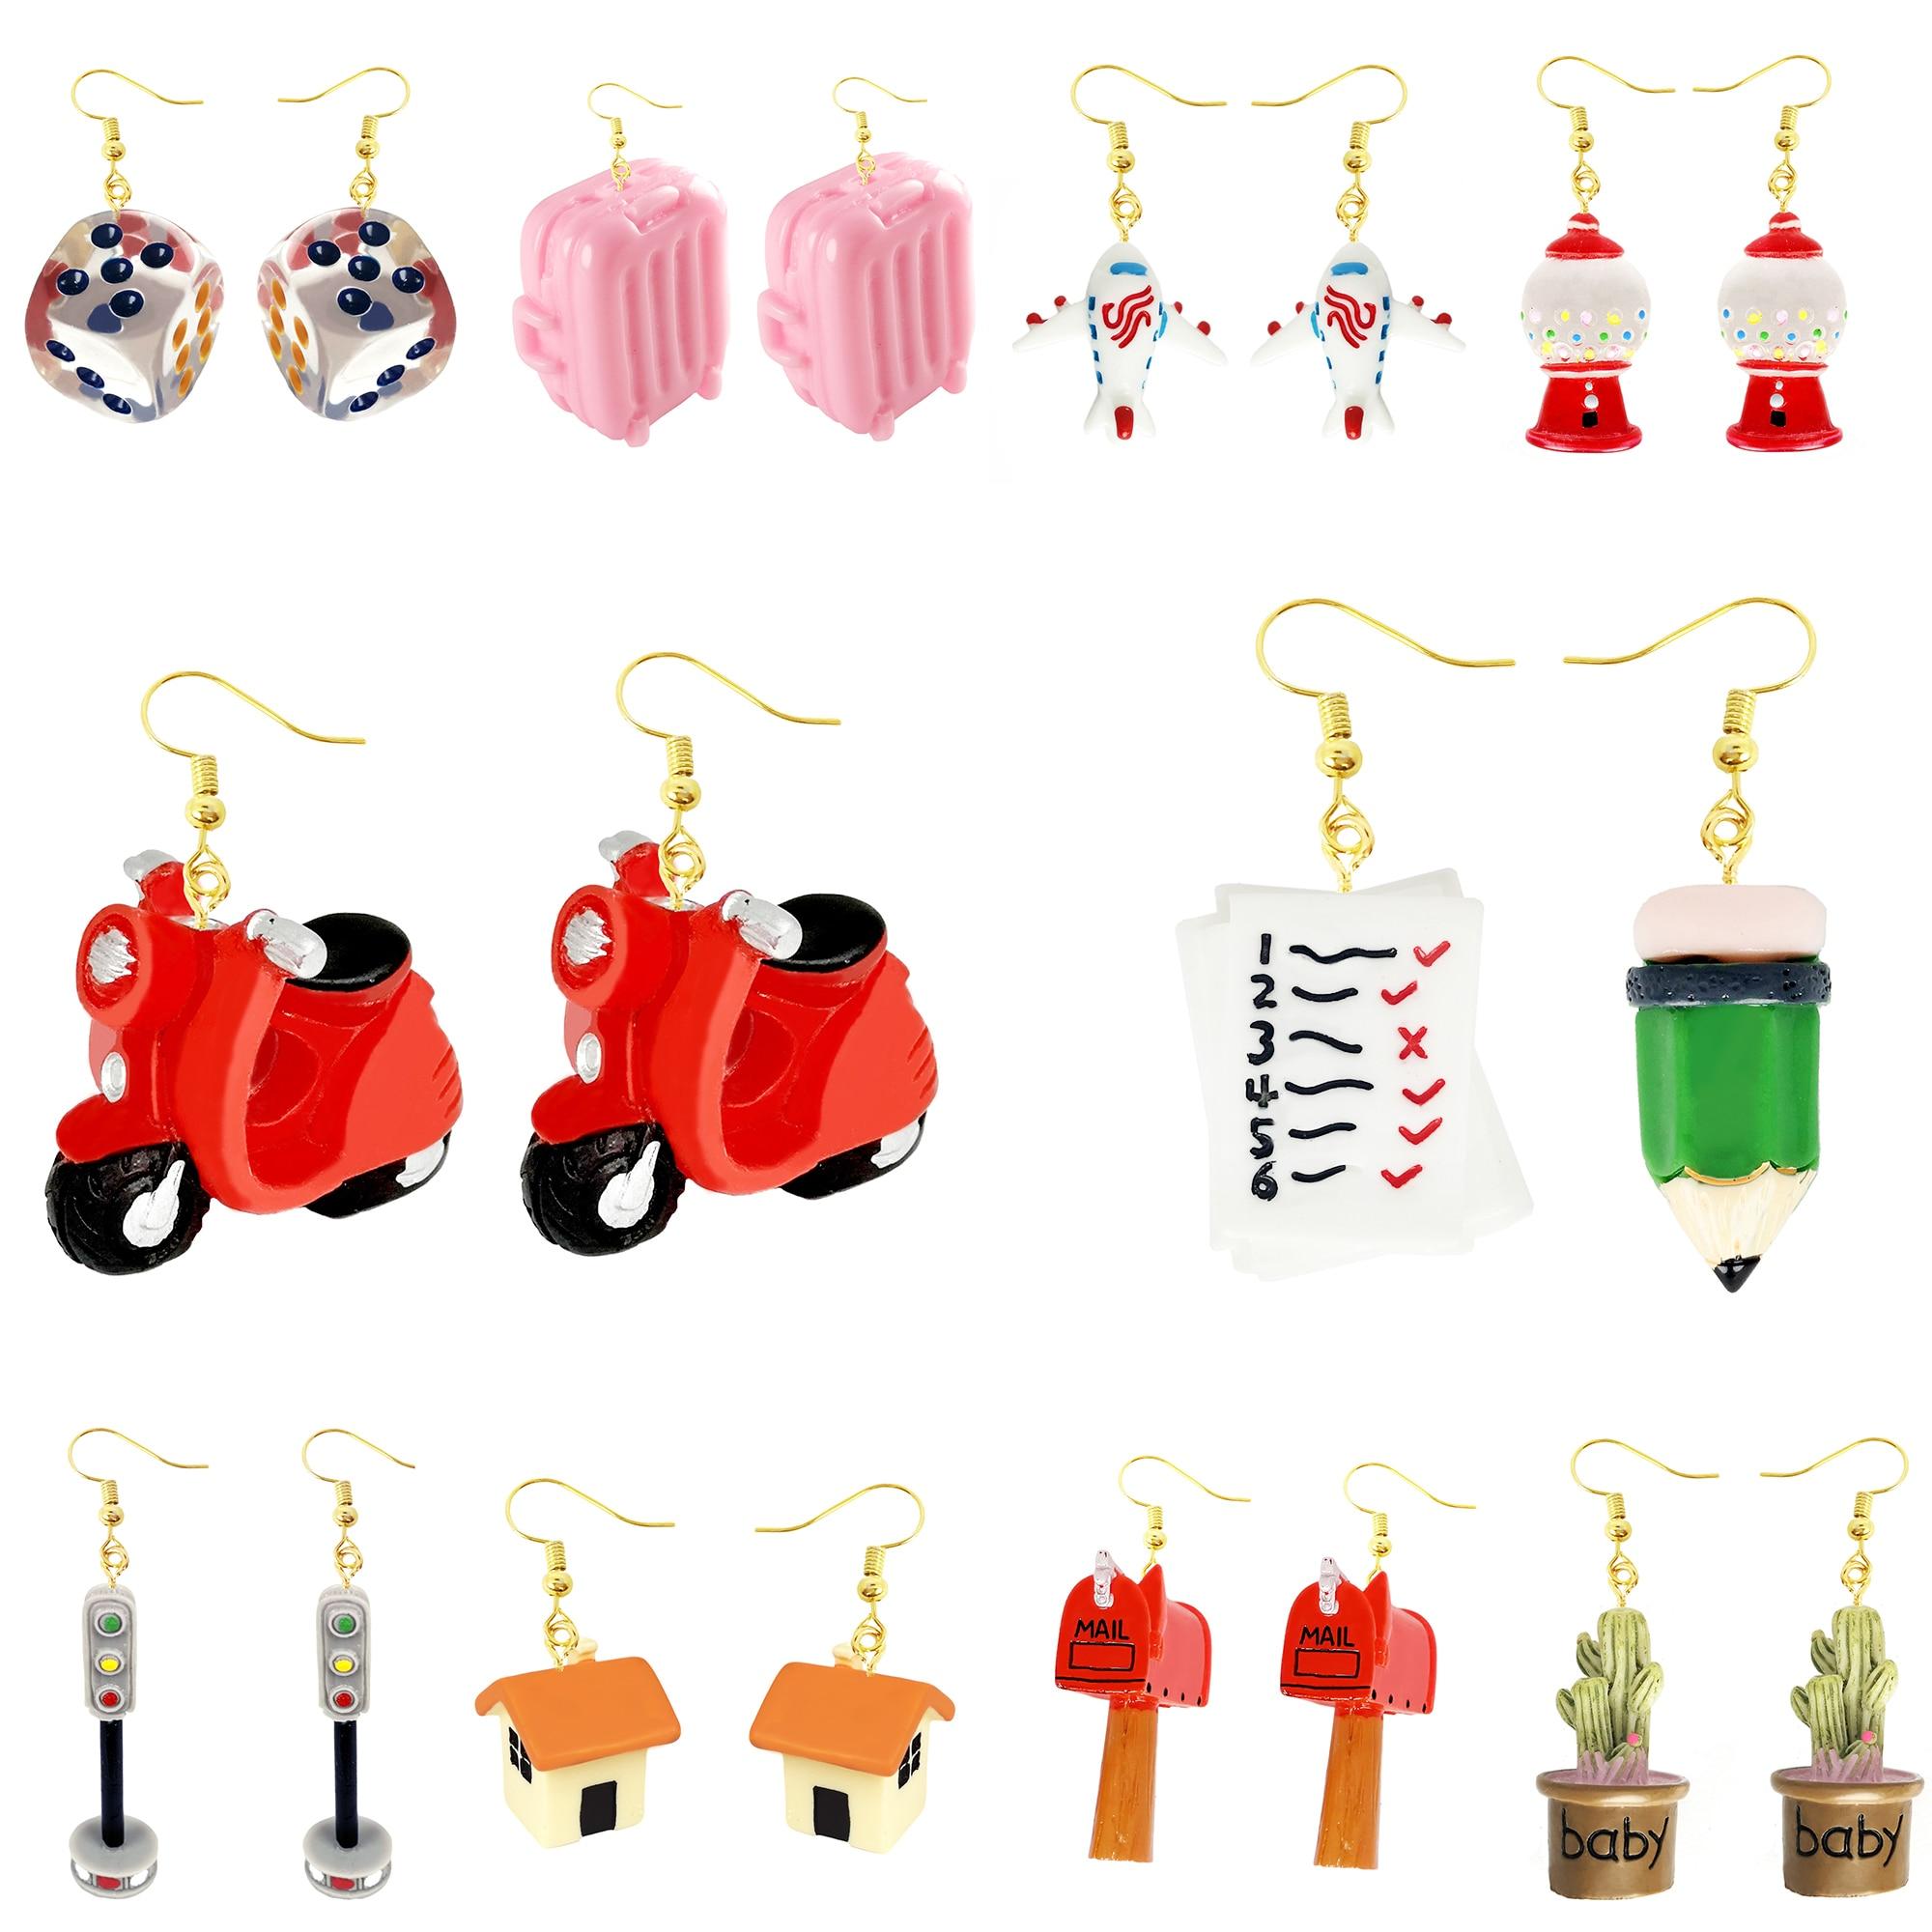 Women Earring Made Cute Girls Eardrop Funny Gift Sweet Handmade Cartoons Mini Plane Traffic Lights Dice Cactus